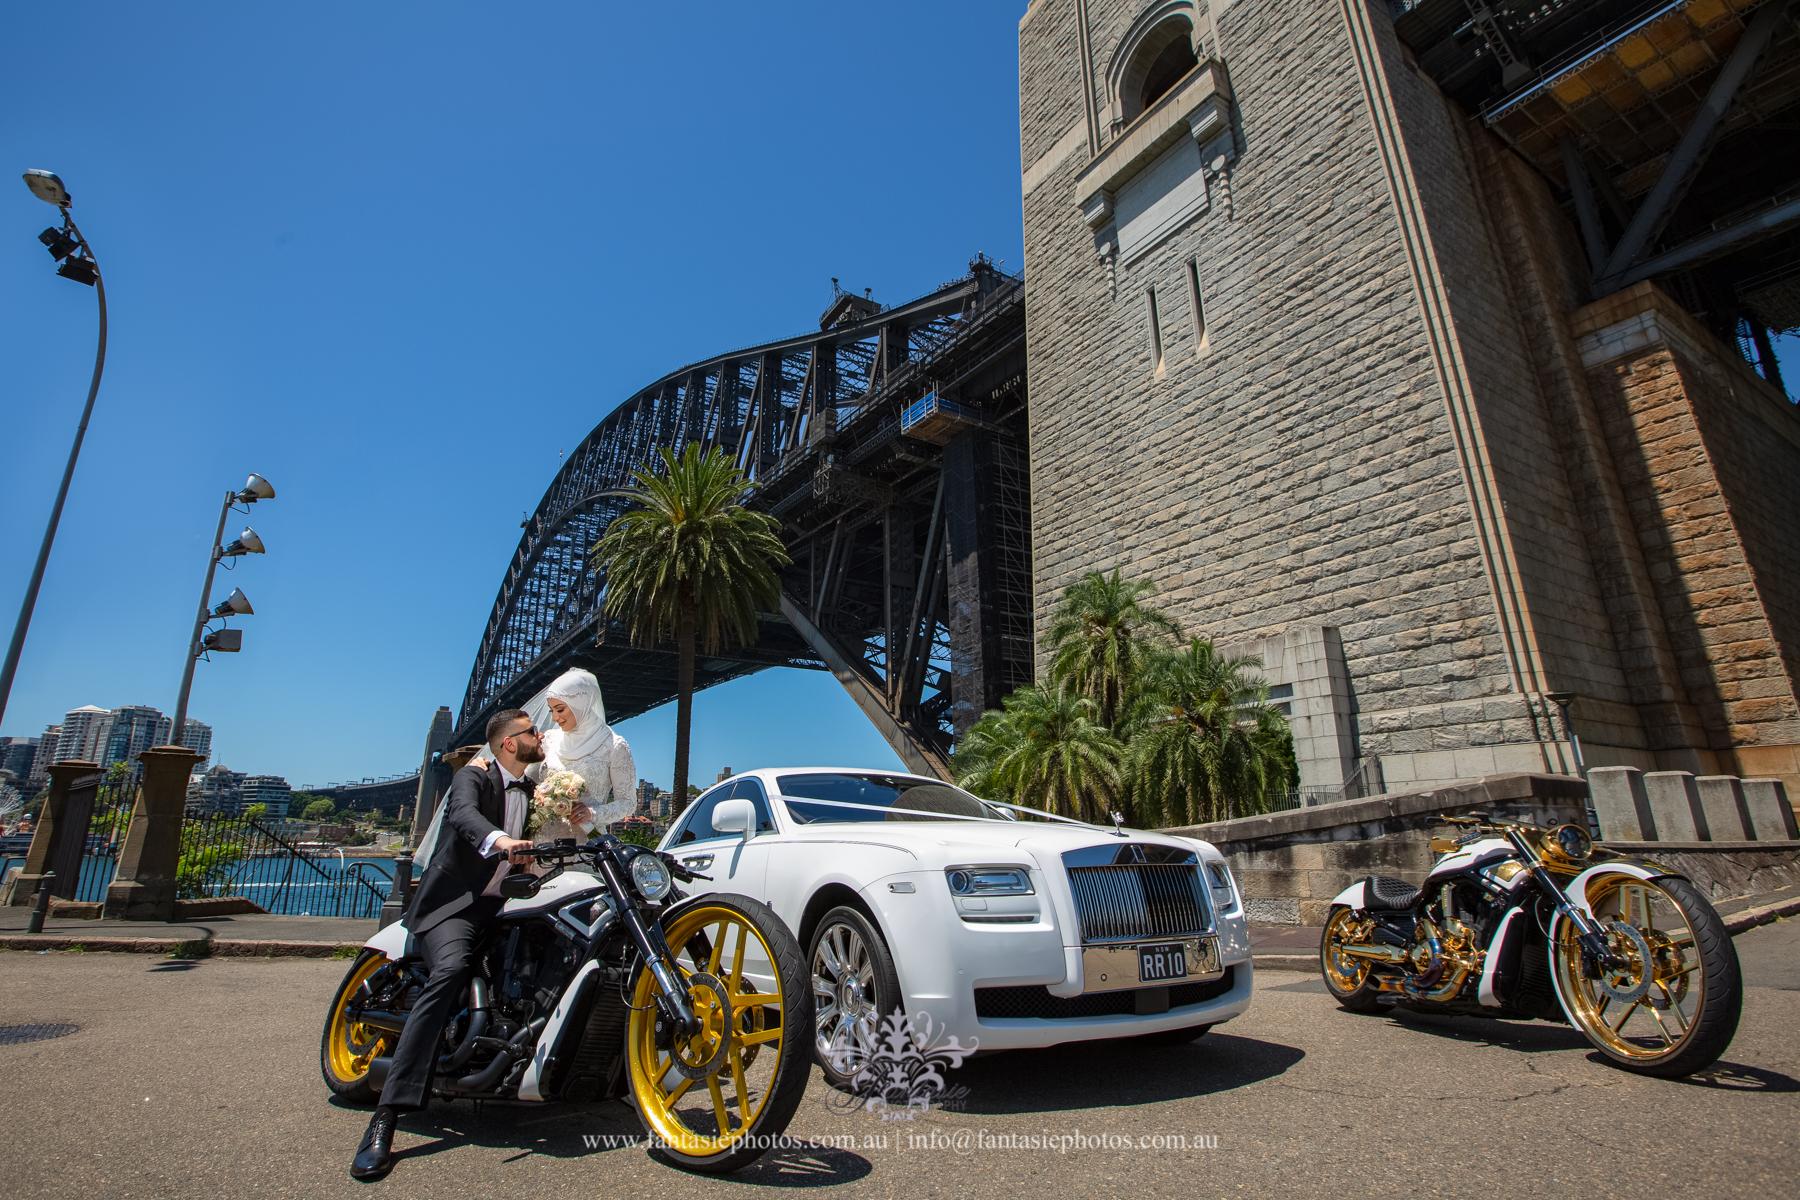 Wedding Photography Sydney The Rocks | Fantasie Photography